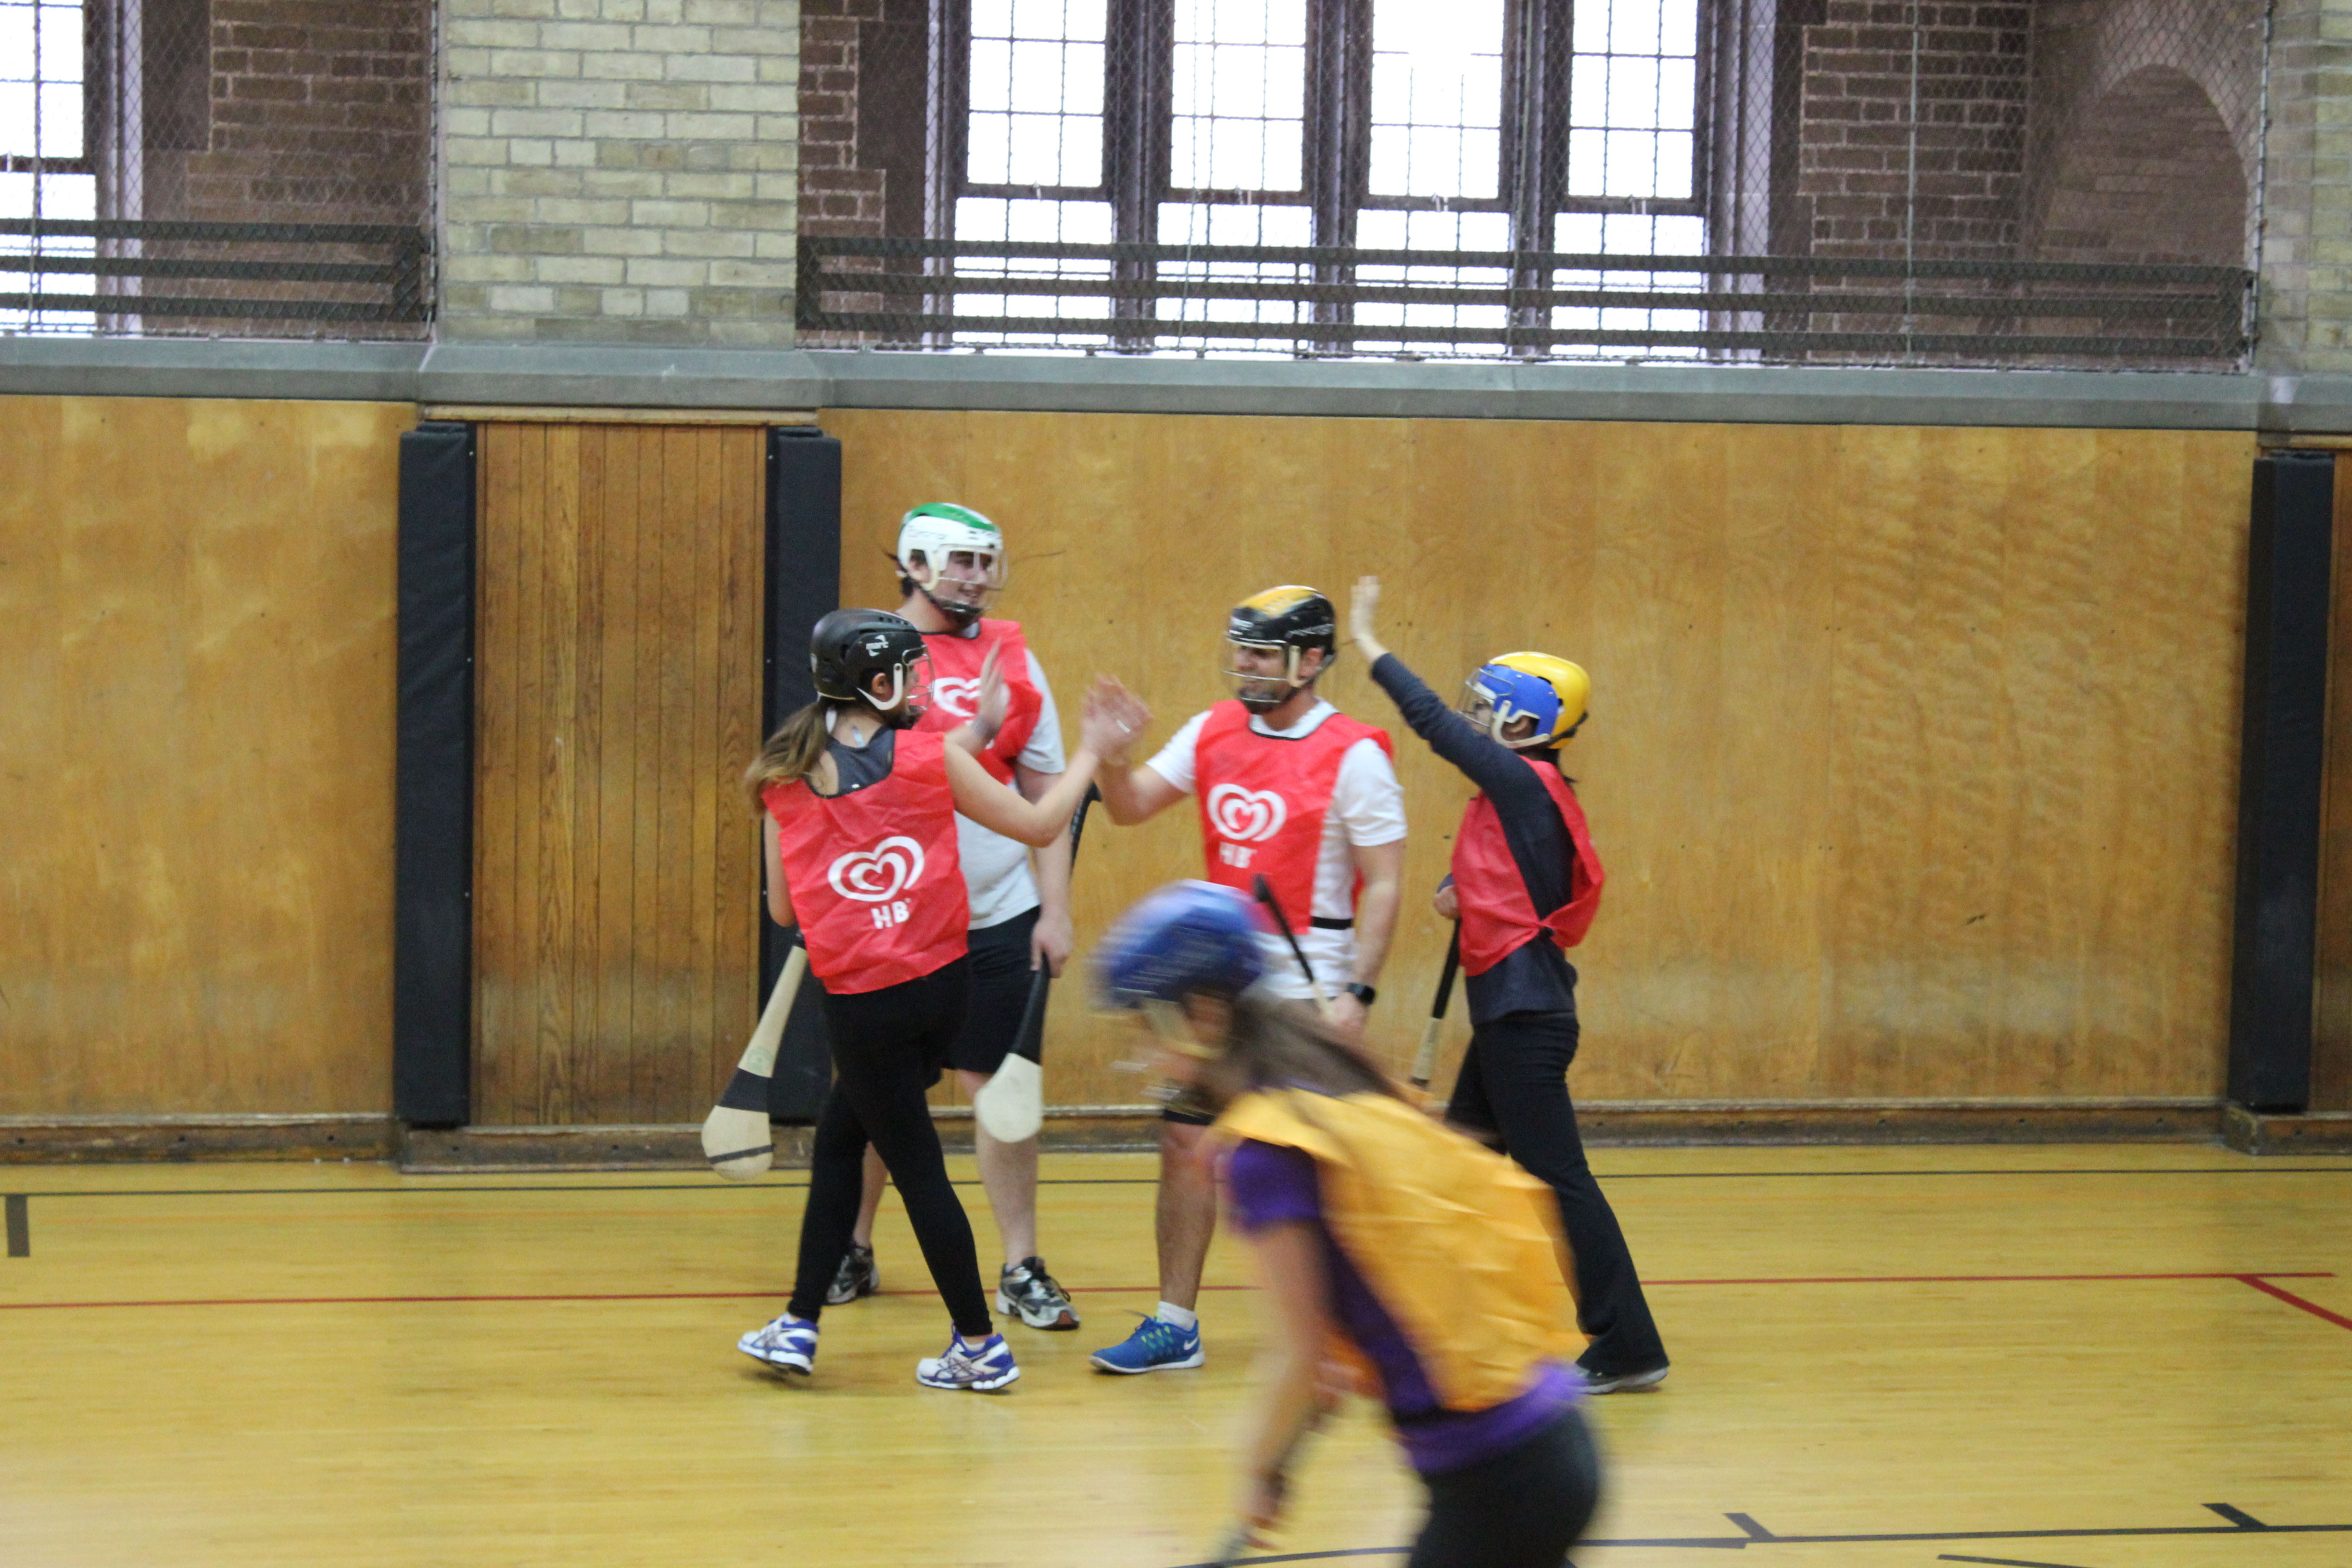 UofT Hurling Lessons match